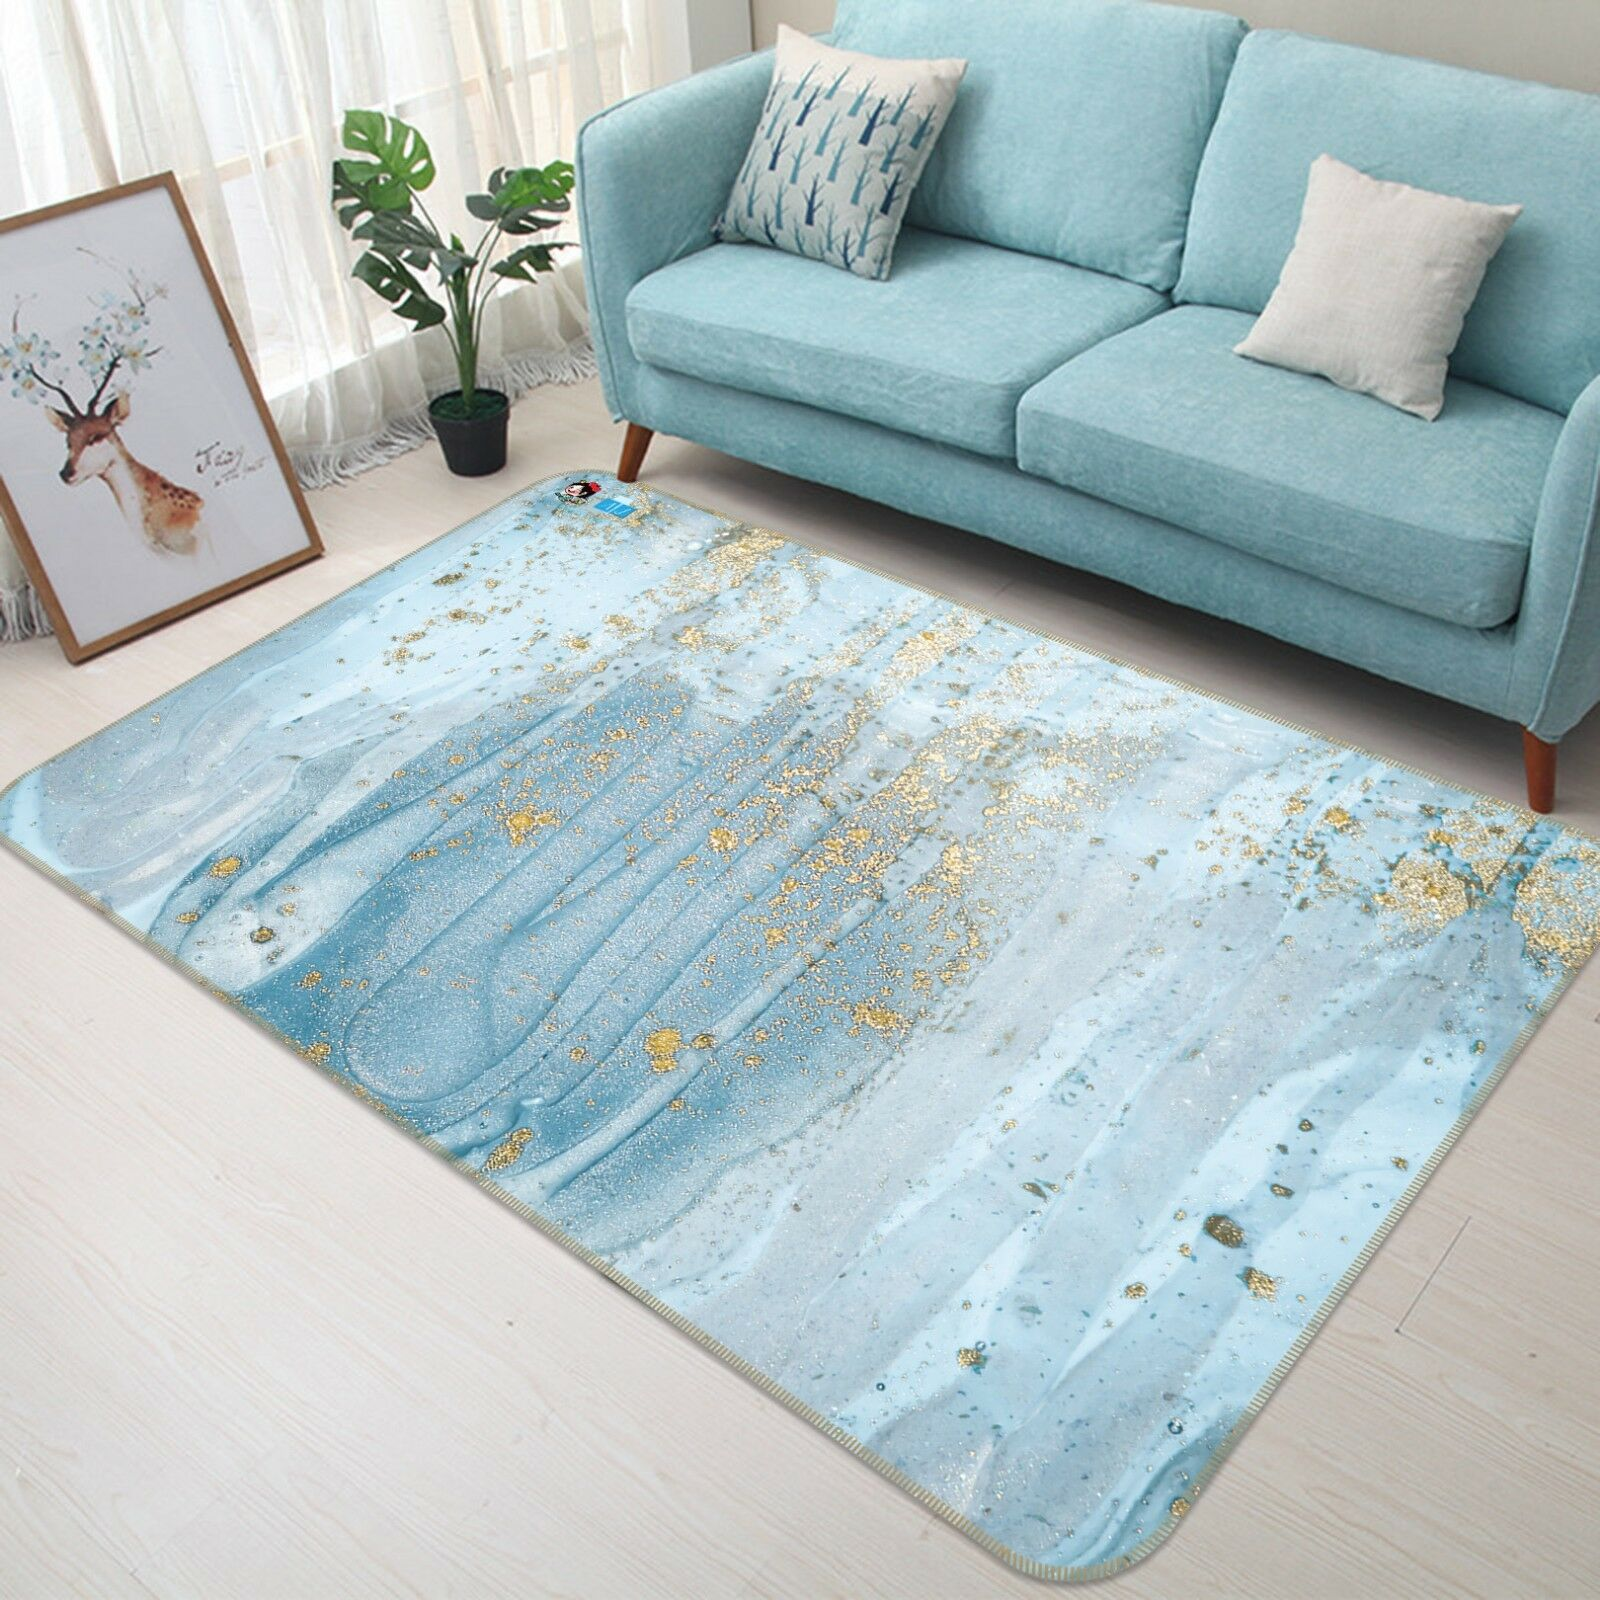 3D Blau Water Texture 77 Non Slip Rug Rug Rug Mat Room Mat Quality Elegant Photo Carpet 077157